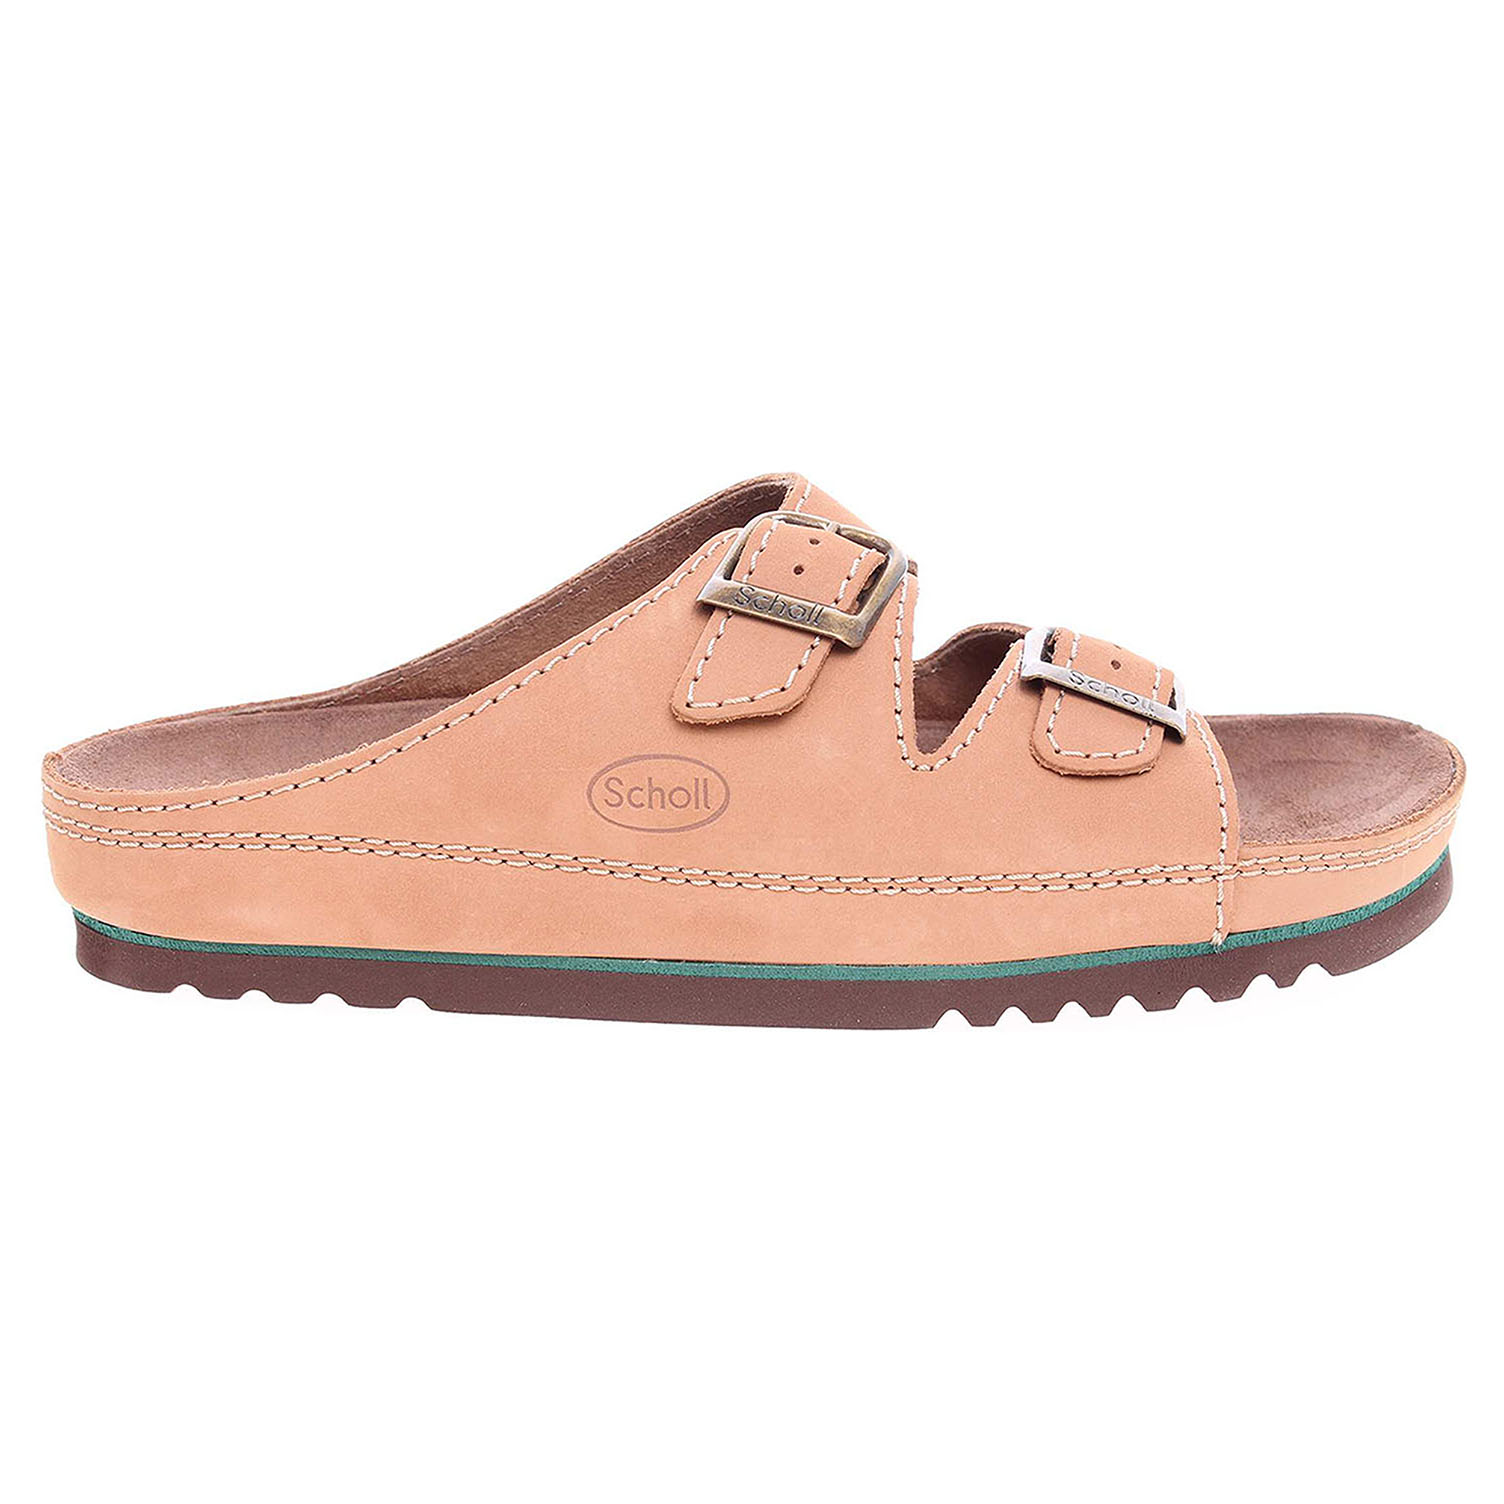 Ecco Scholl pánské pantofle F21531 1016 Air Bag beige 24800256